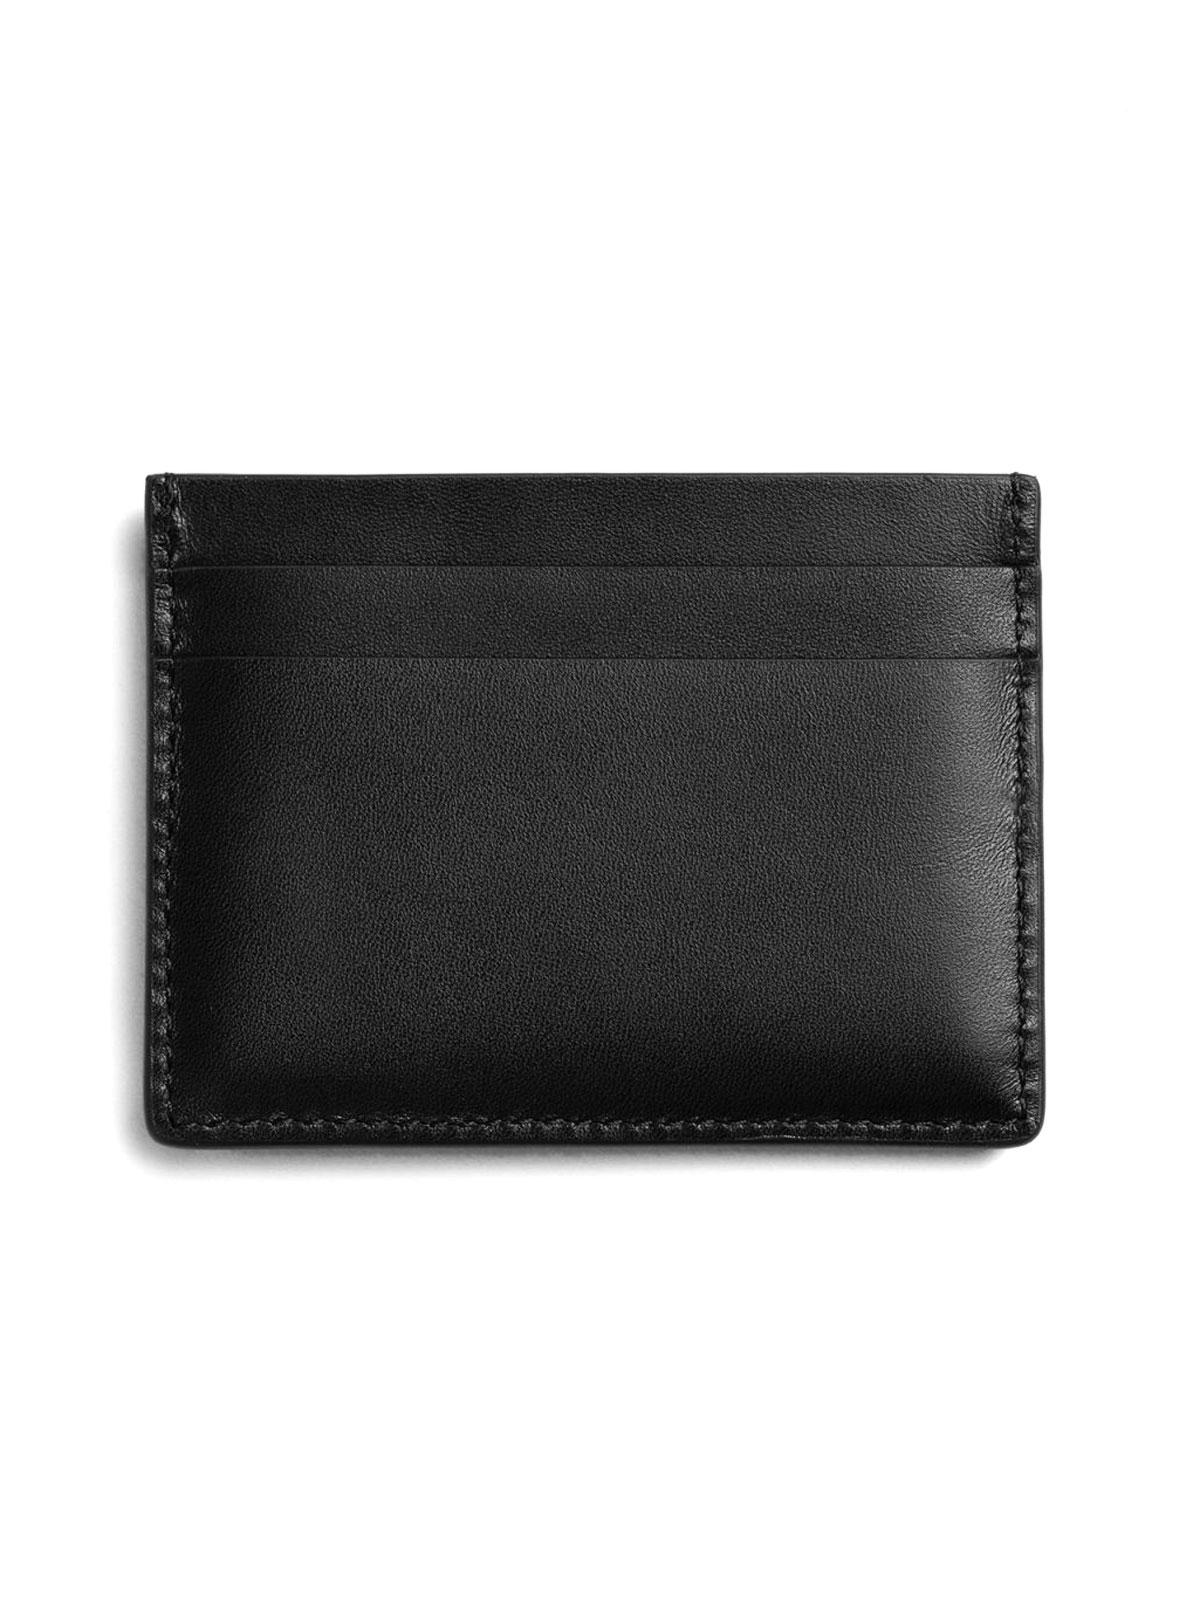 Picture of Gant | Wallet D1. Leather Cardholder